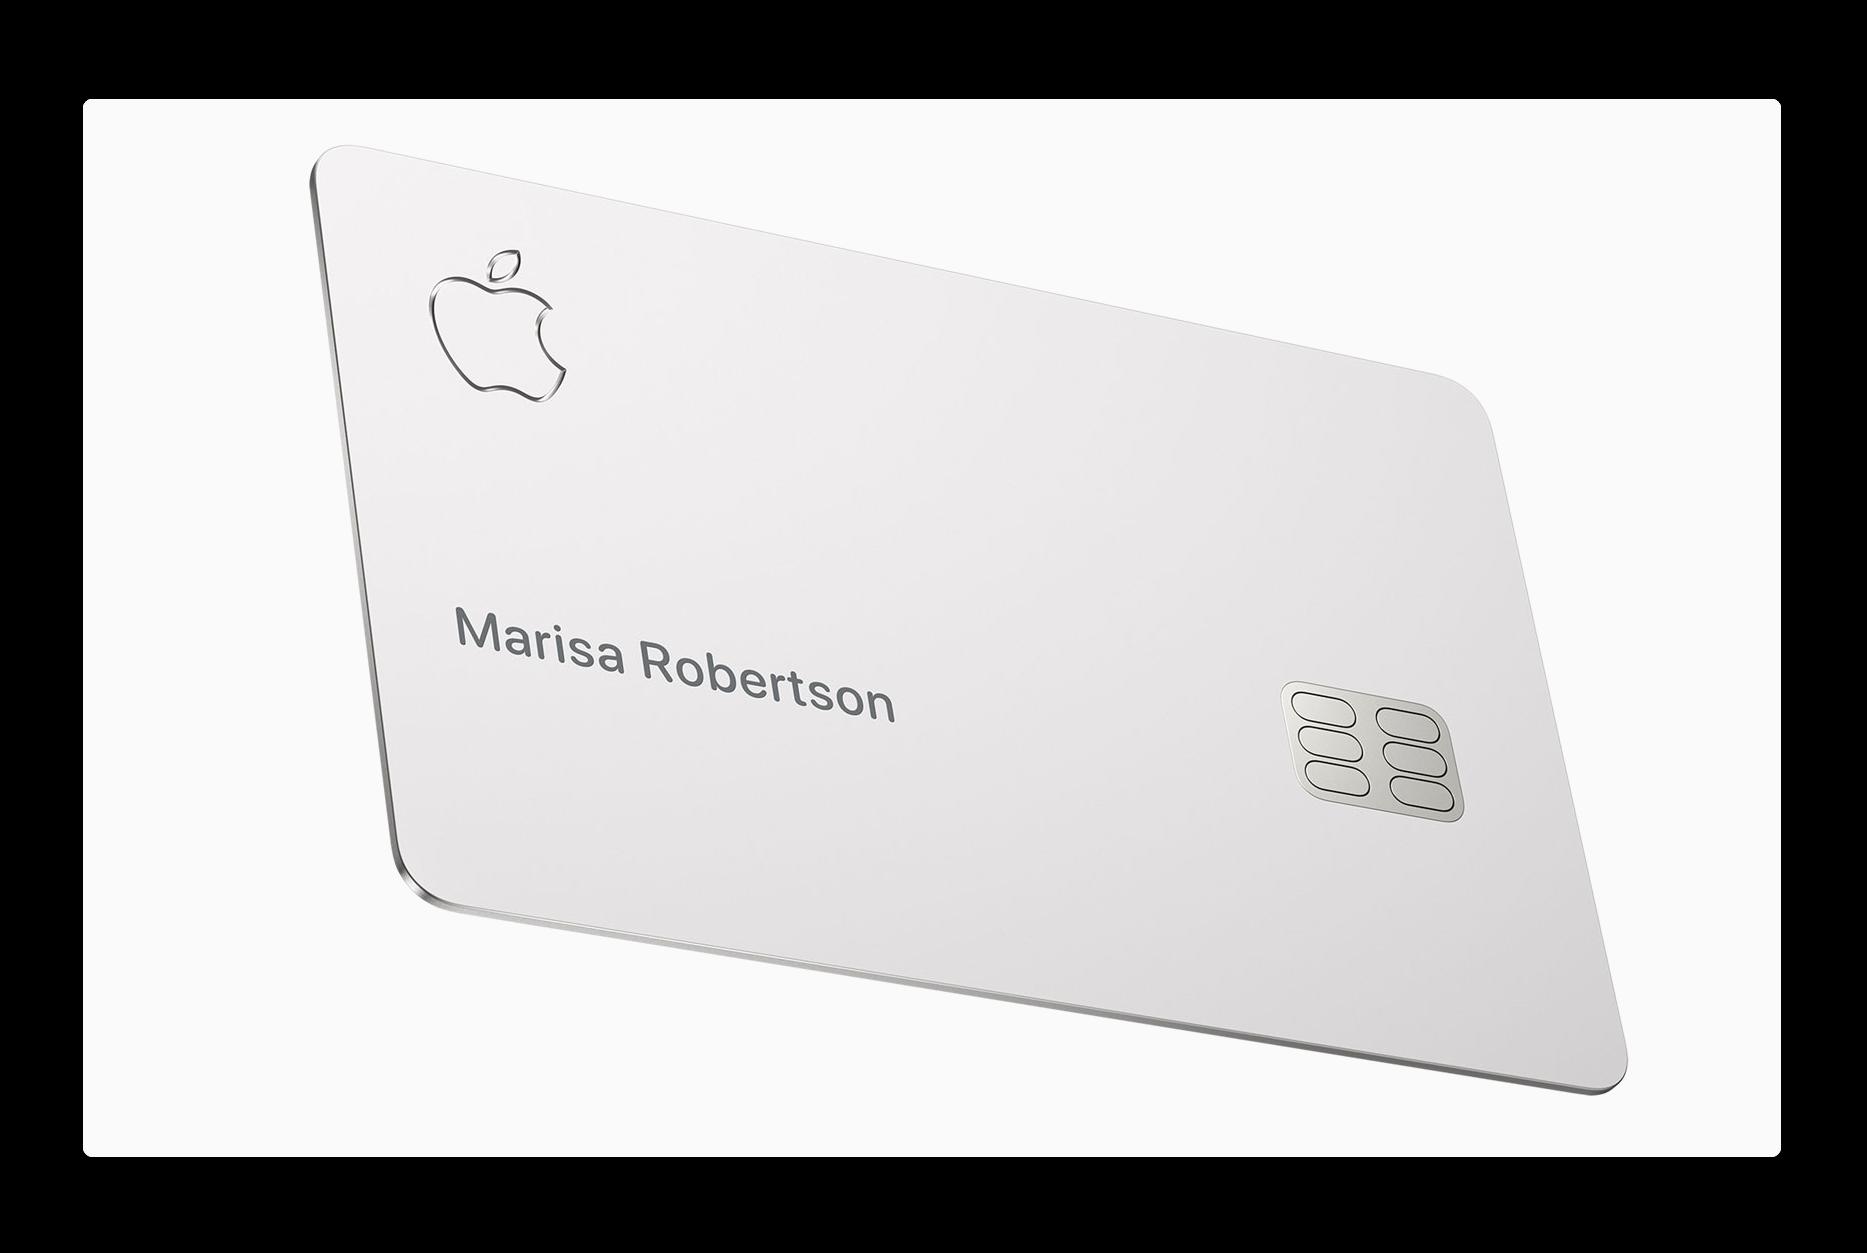 Apple、「Apple Card Design」と題する新しいCFを公開